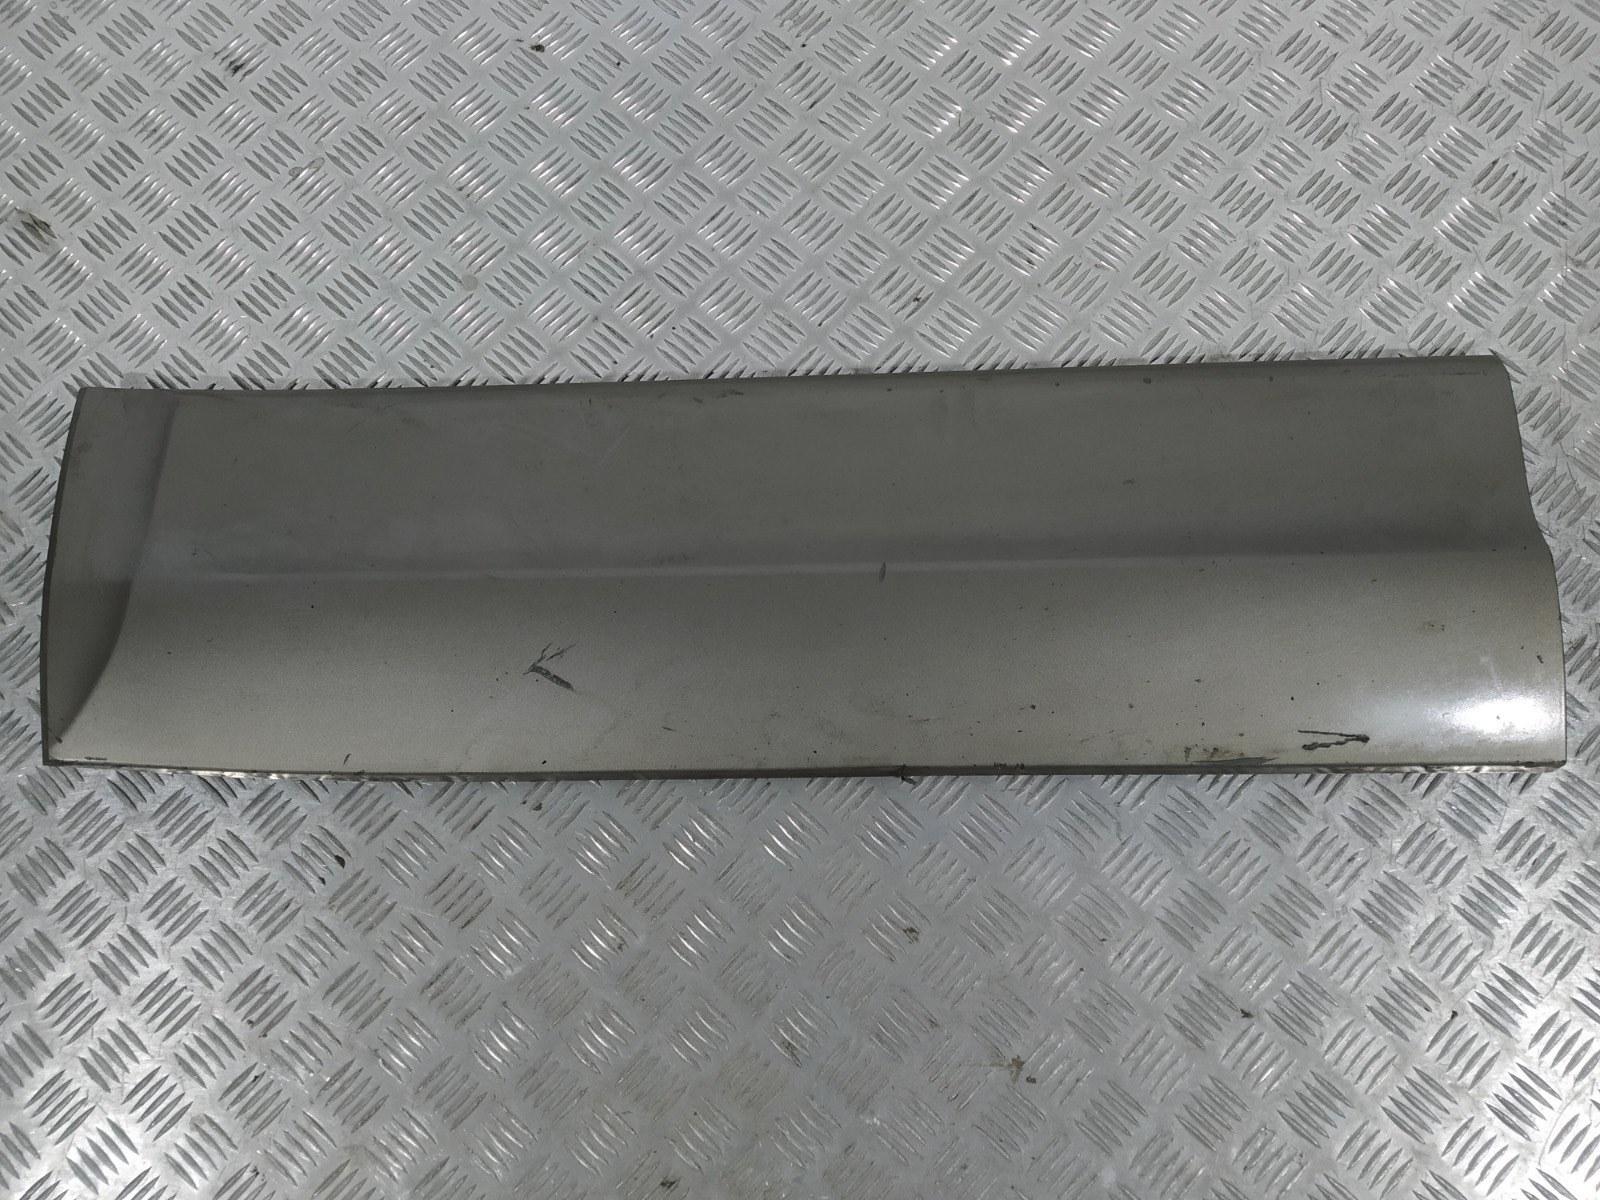 Молдинг двери передней левой Mazda Tribute 3.0 I 2004 (б/у)